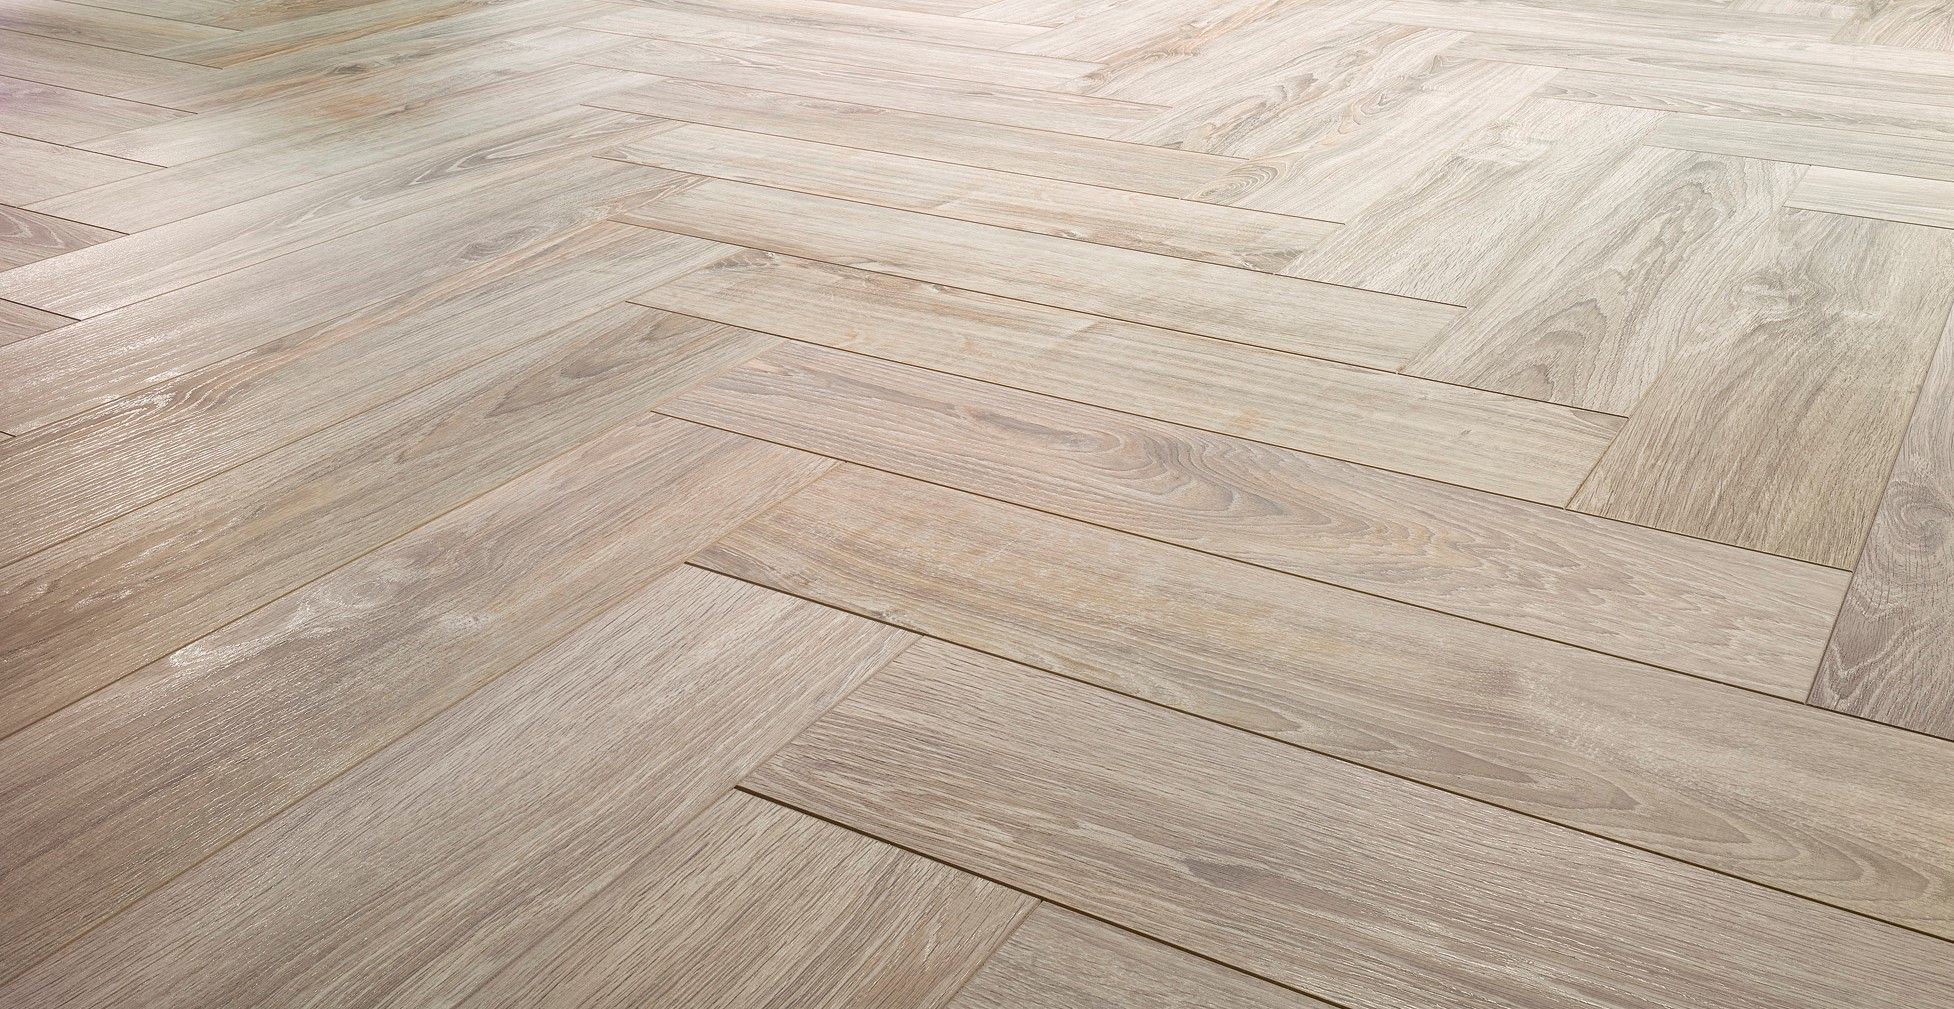 Panele Podlogowe 628 Majorka 12mm Ac6 Jodelka 7354552156 Oficjalne Archiwum Allegro Flooring Hardwood Hardwood Floors